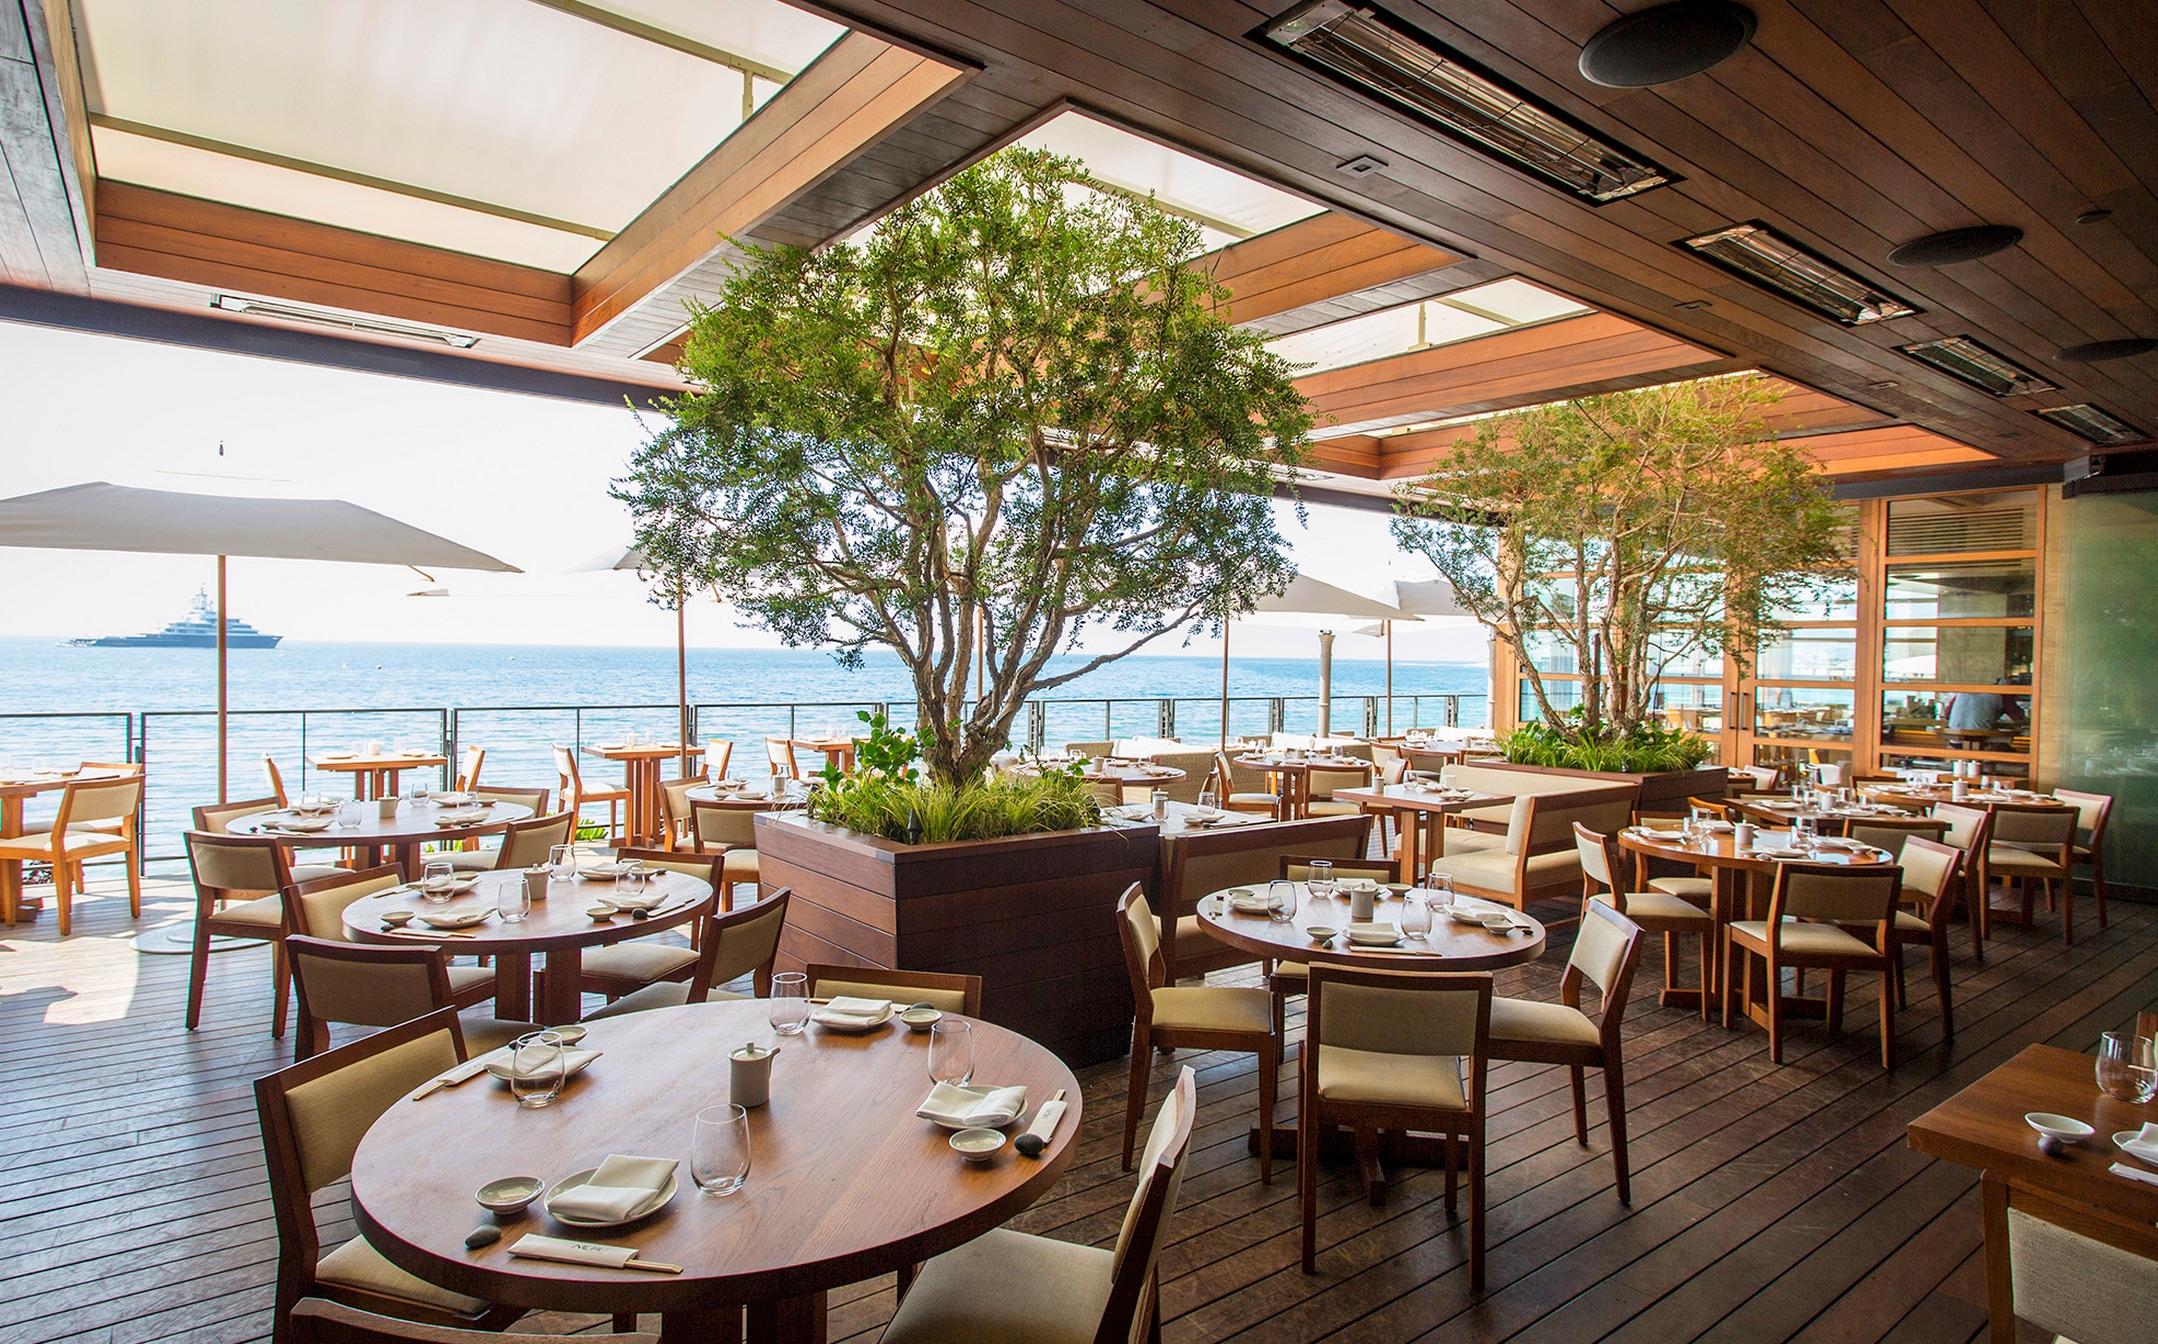 Outdoor Dining Restaurants In Los Angeles Spring 2017